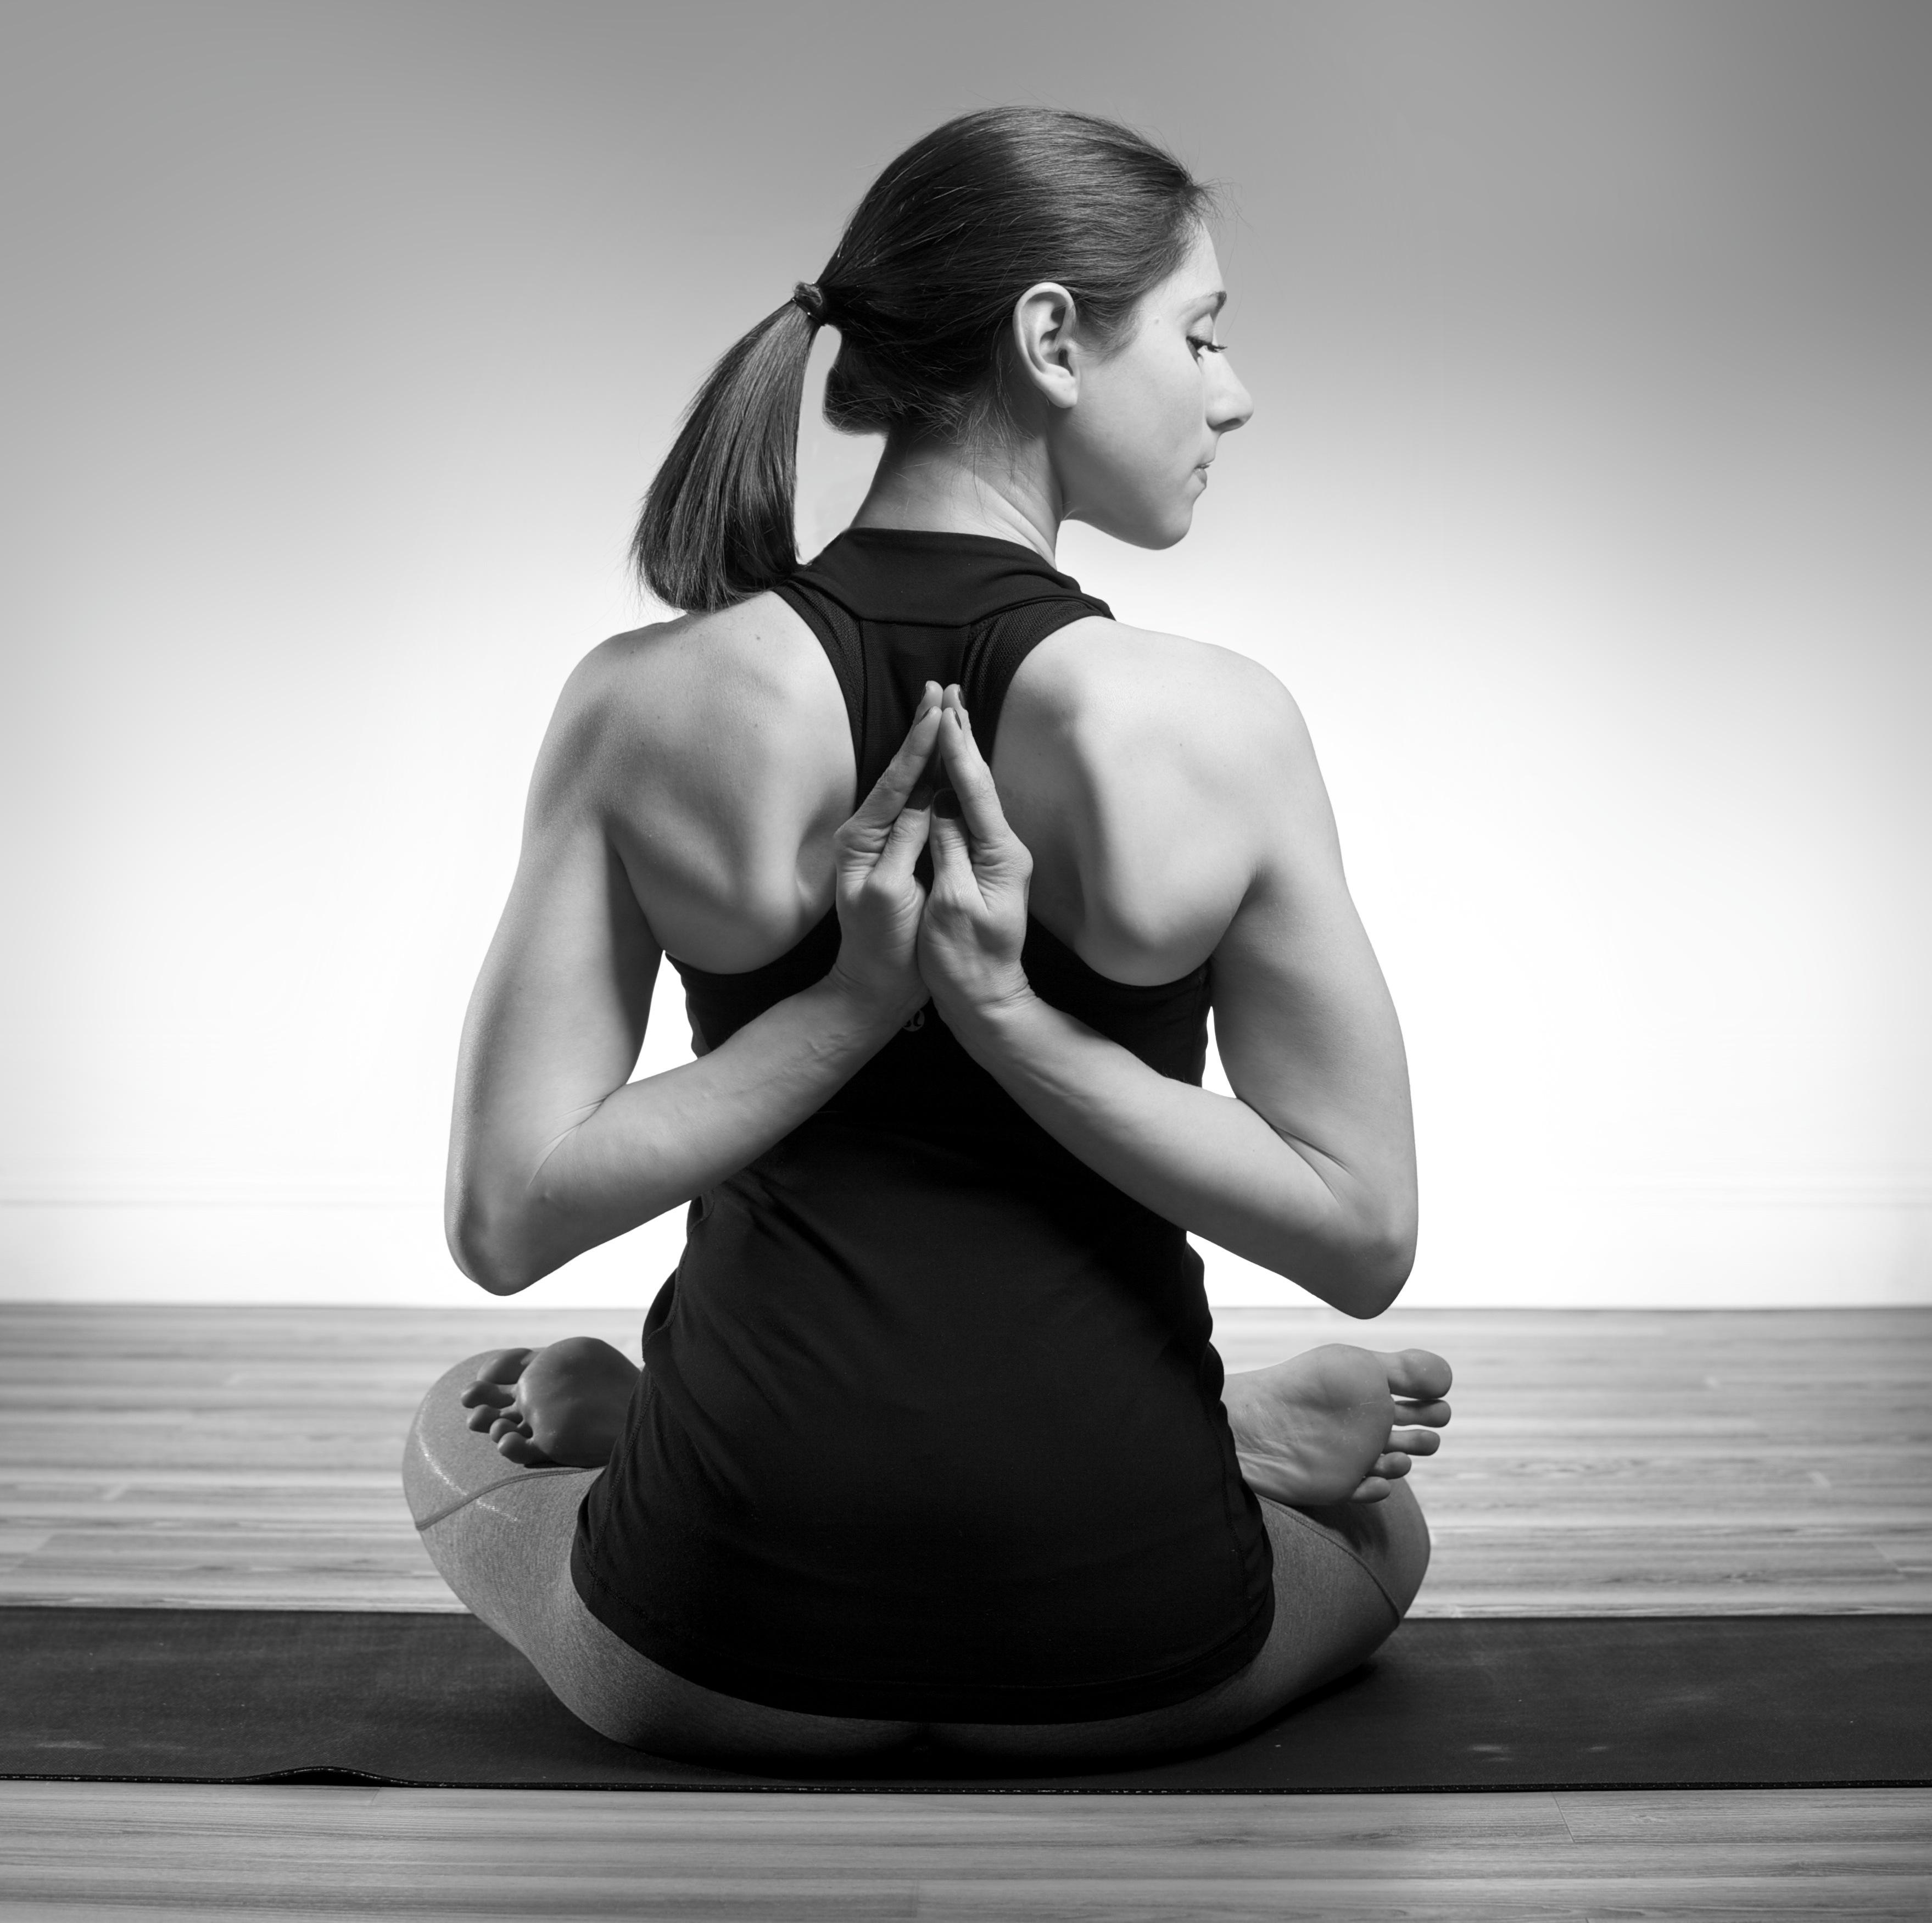 nicole_newman_lotus_padmasana_reverse_prayer_paschima_ namaskarasana_yoga_pose copy